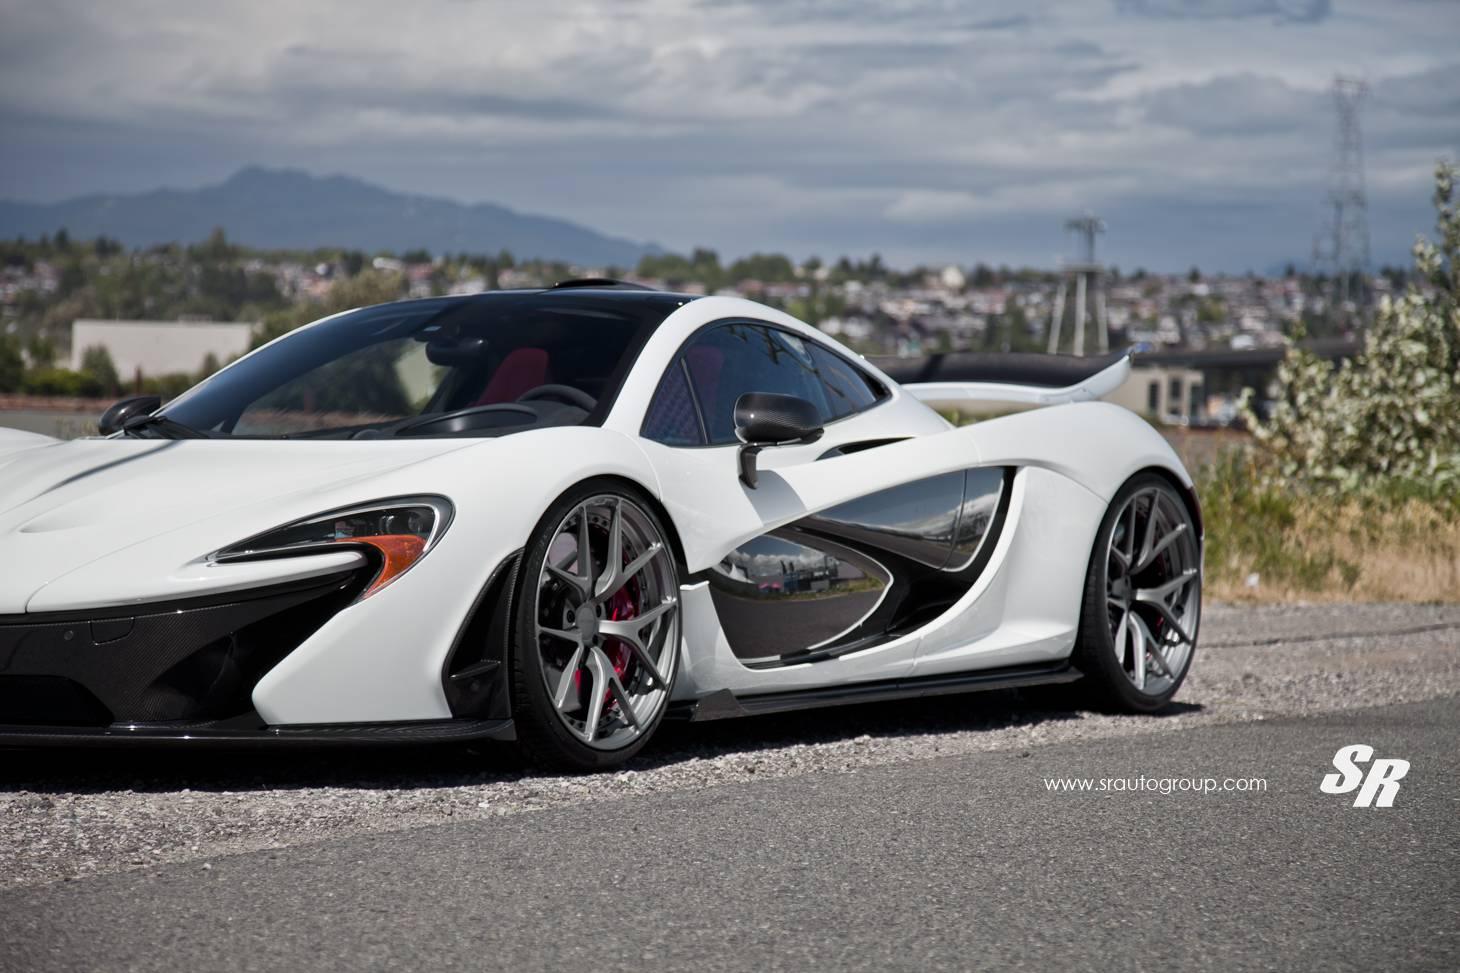 McLaren P1 tuning wheel/тюнинг колес PUR Wheels